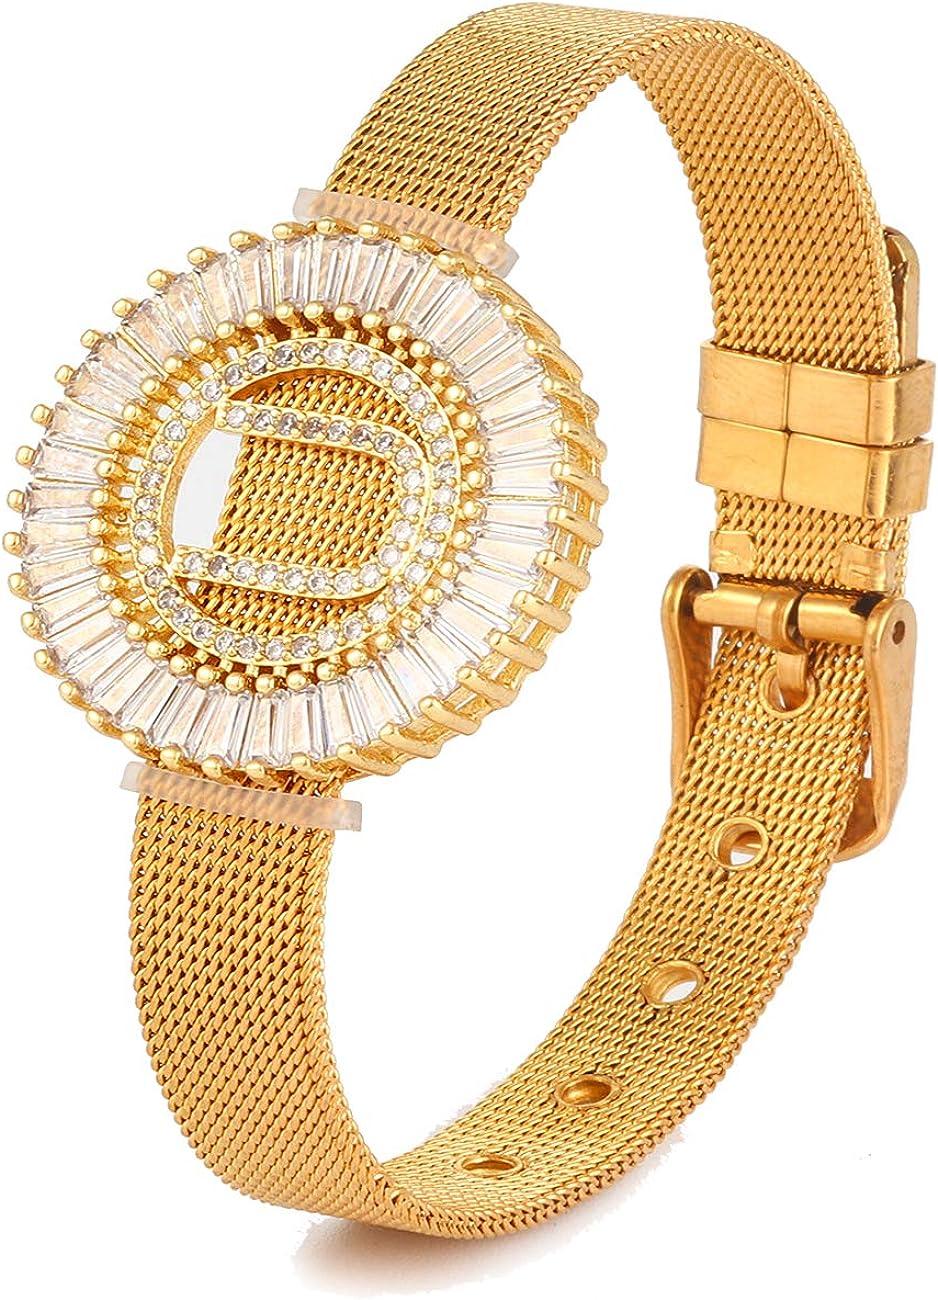 Rhinestone Initial Bracelet 18k Gold Stainless Steel Bangle Brac